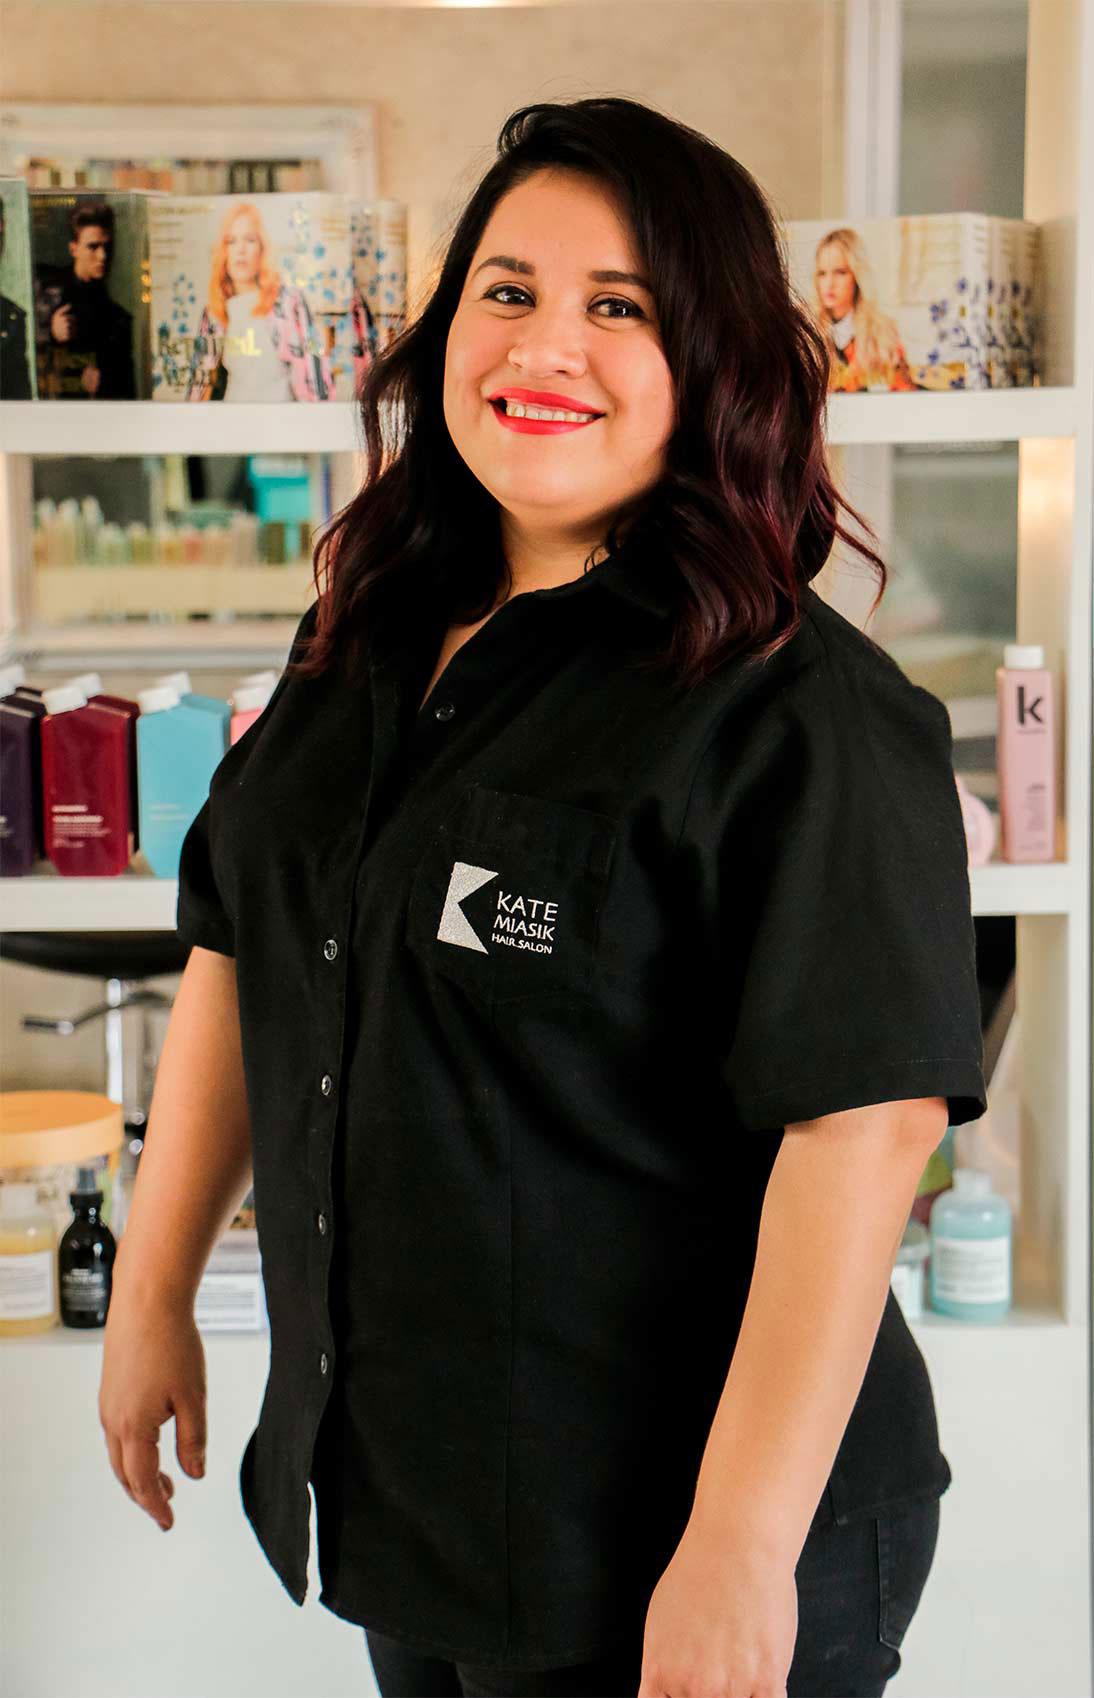 Clara Adaly - Kate Miasik Salon